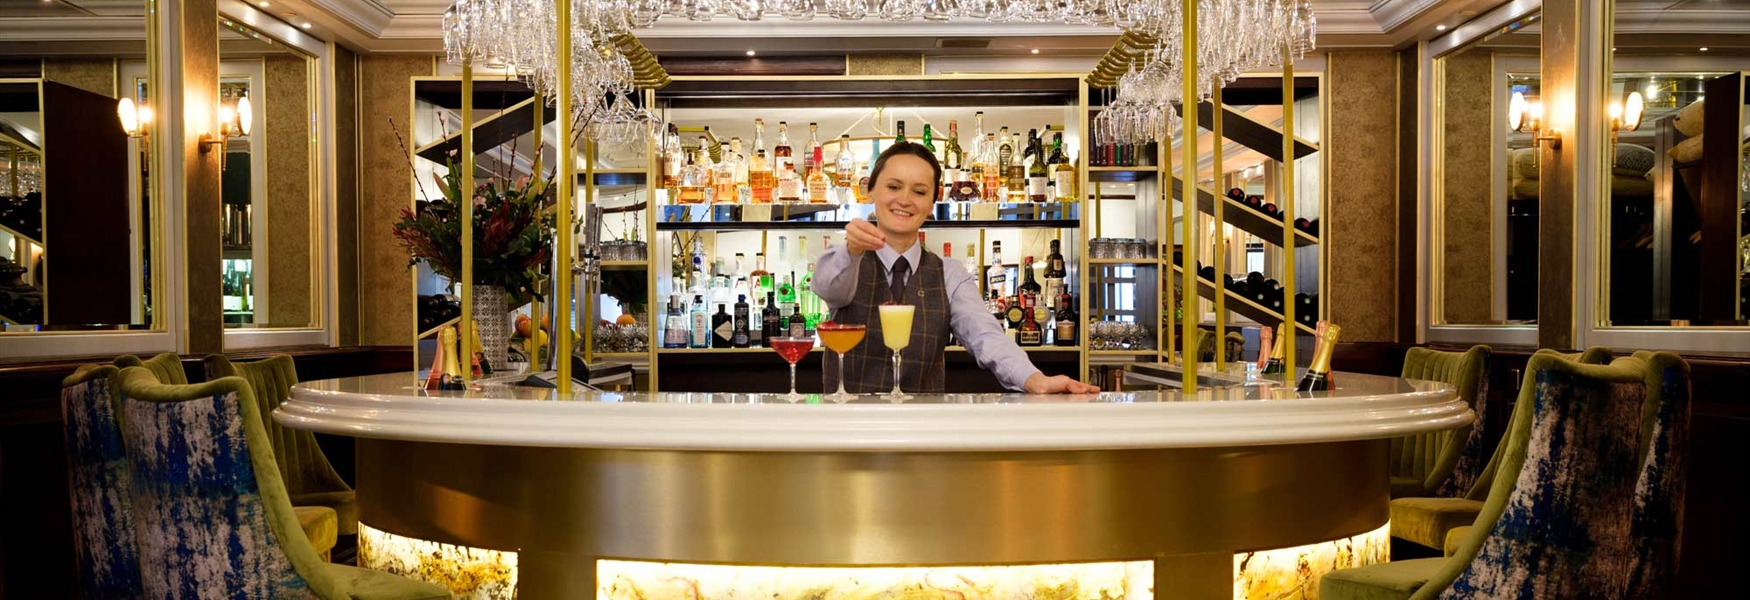 Bar at La Brasserie at The Chester Grosvenor